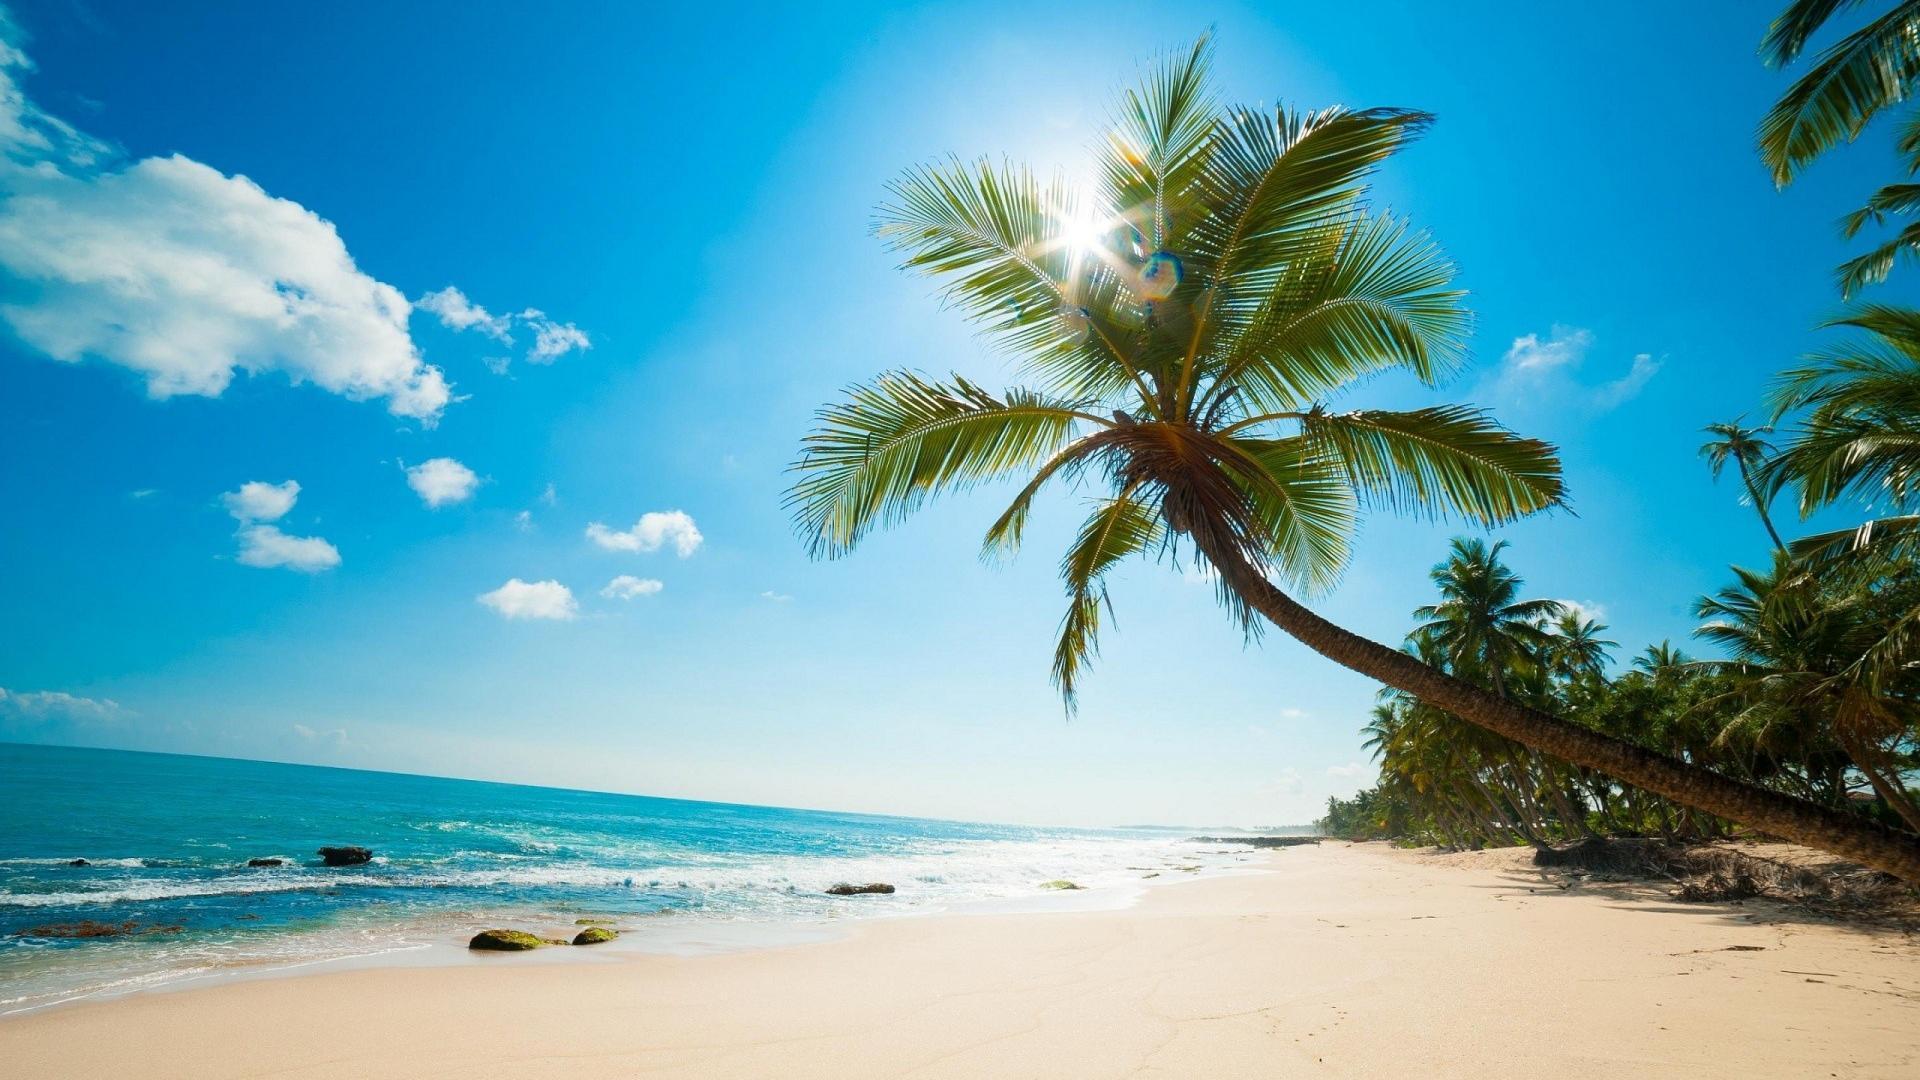 caribbean beach wallpapers top